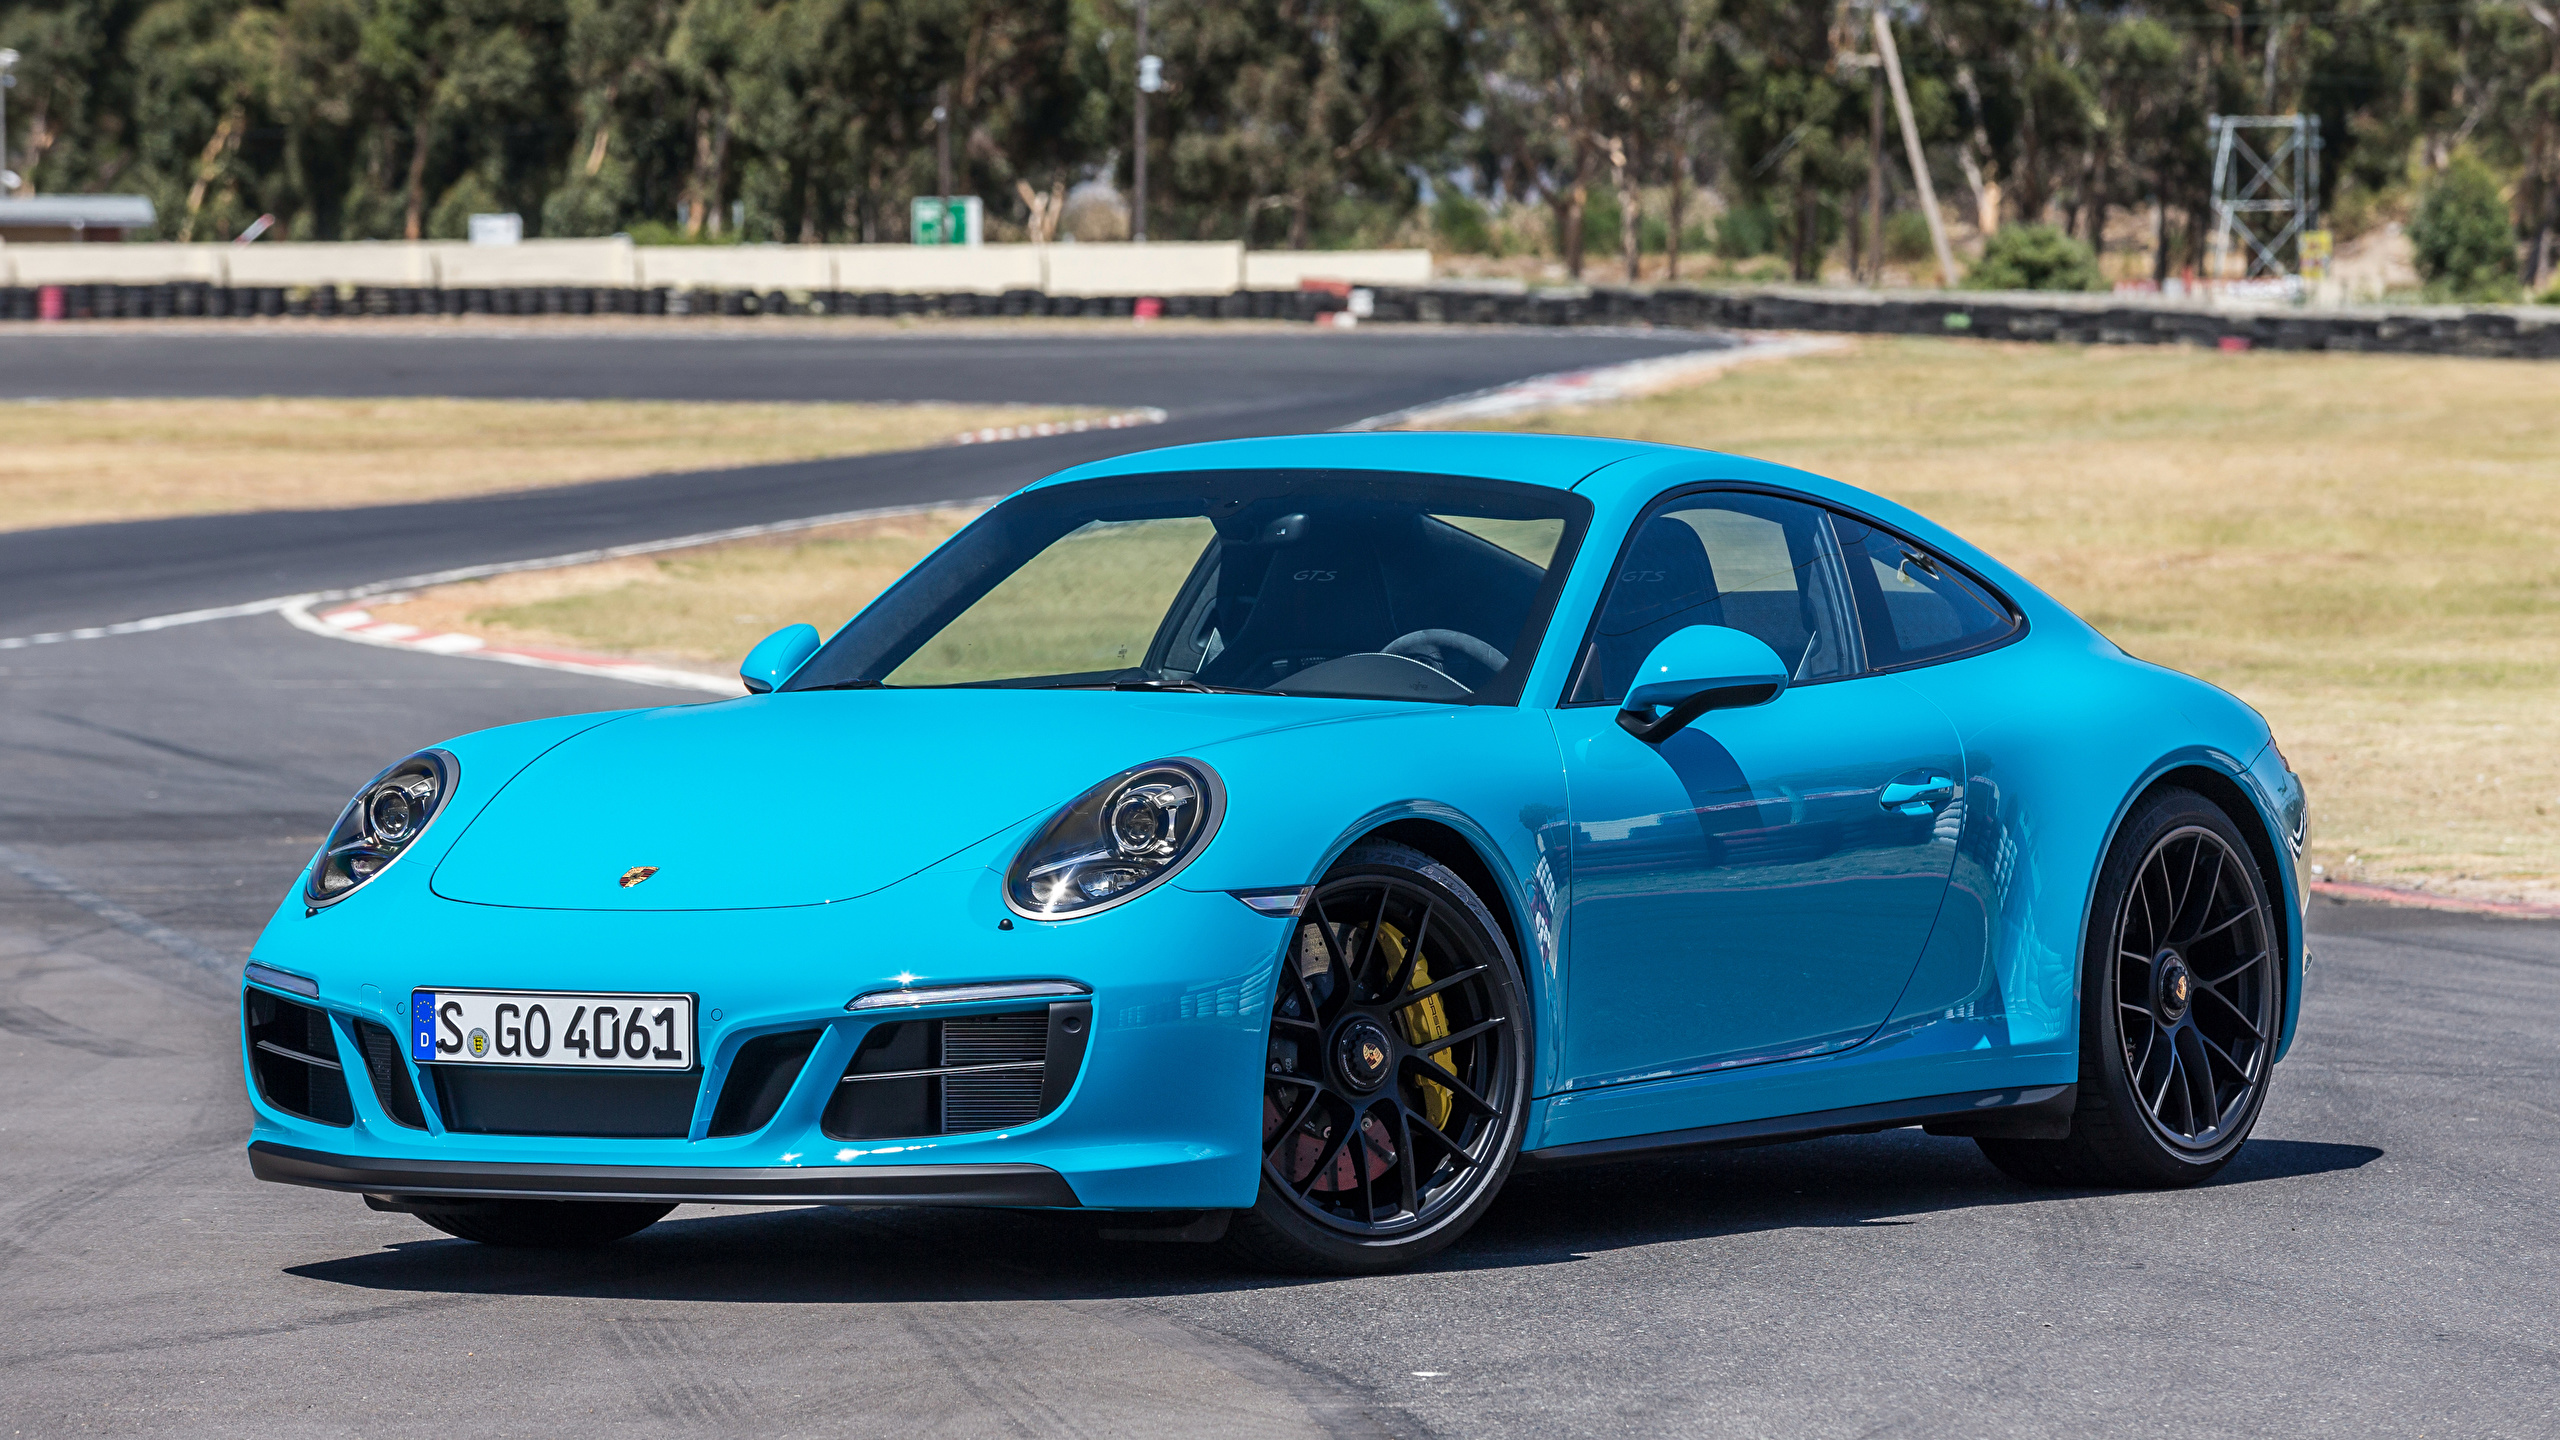 Fondos De Pantalla 2560x1440 Porsche 2017 911 Carrera Gts